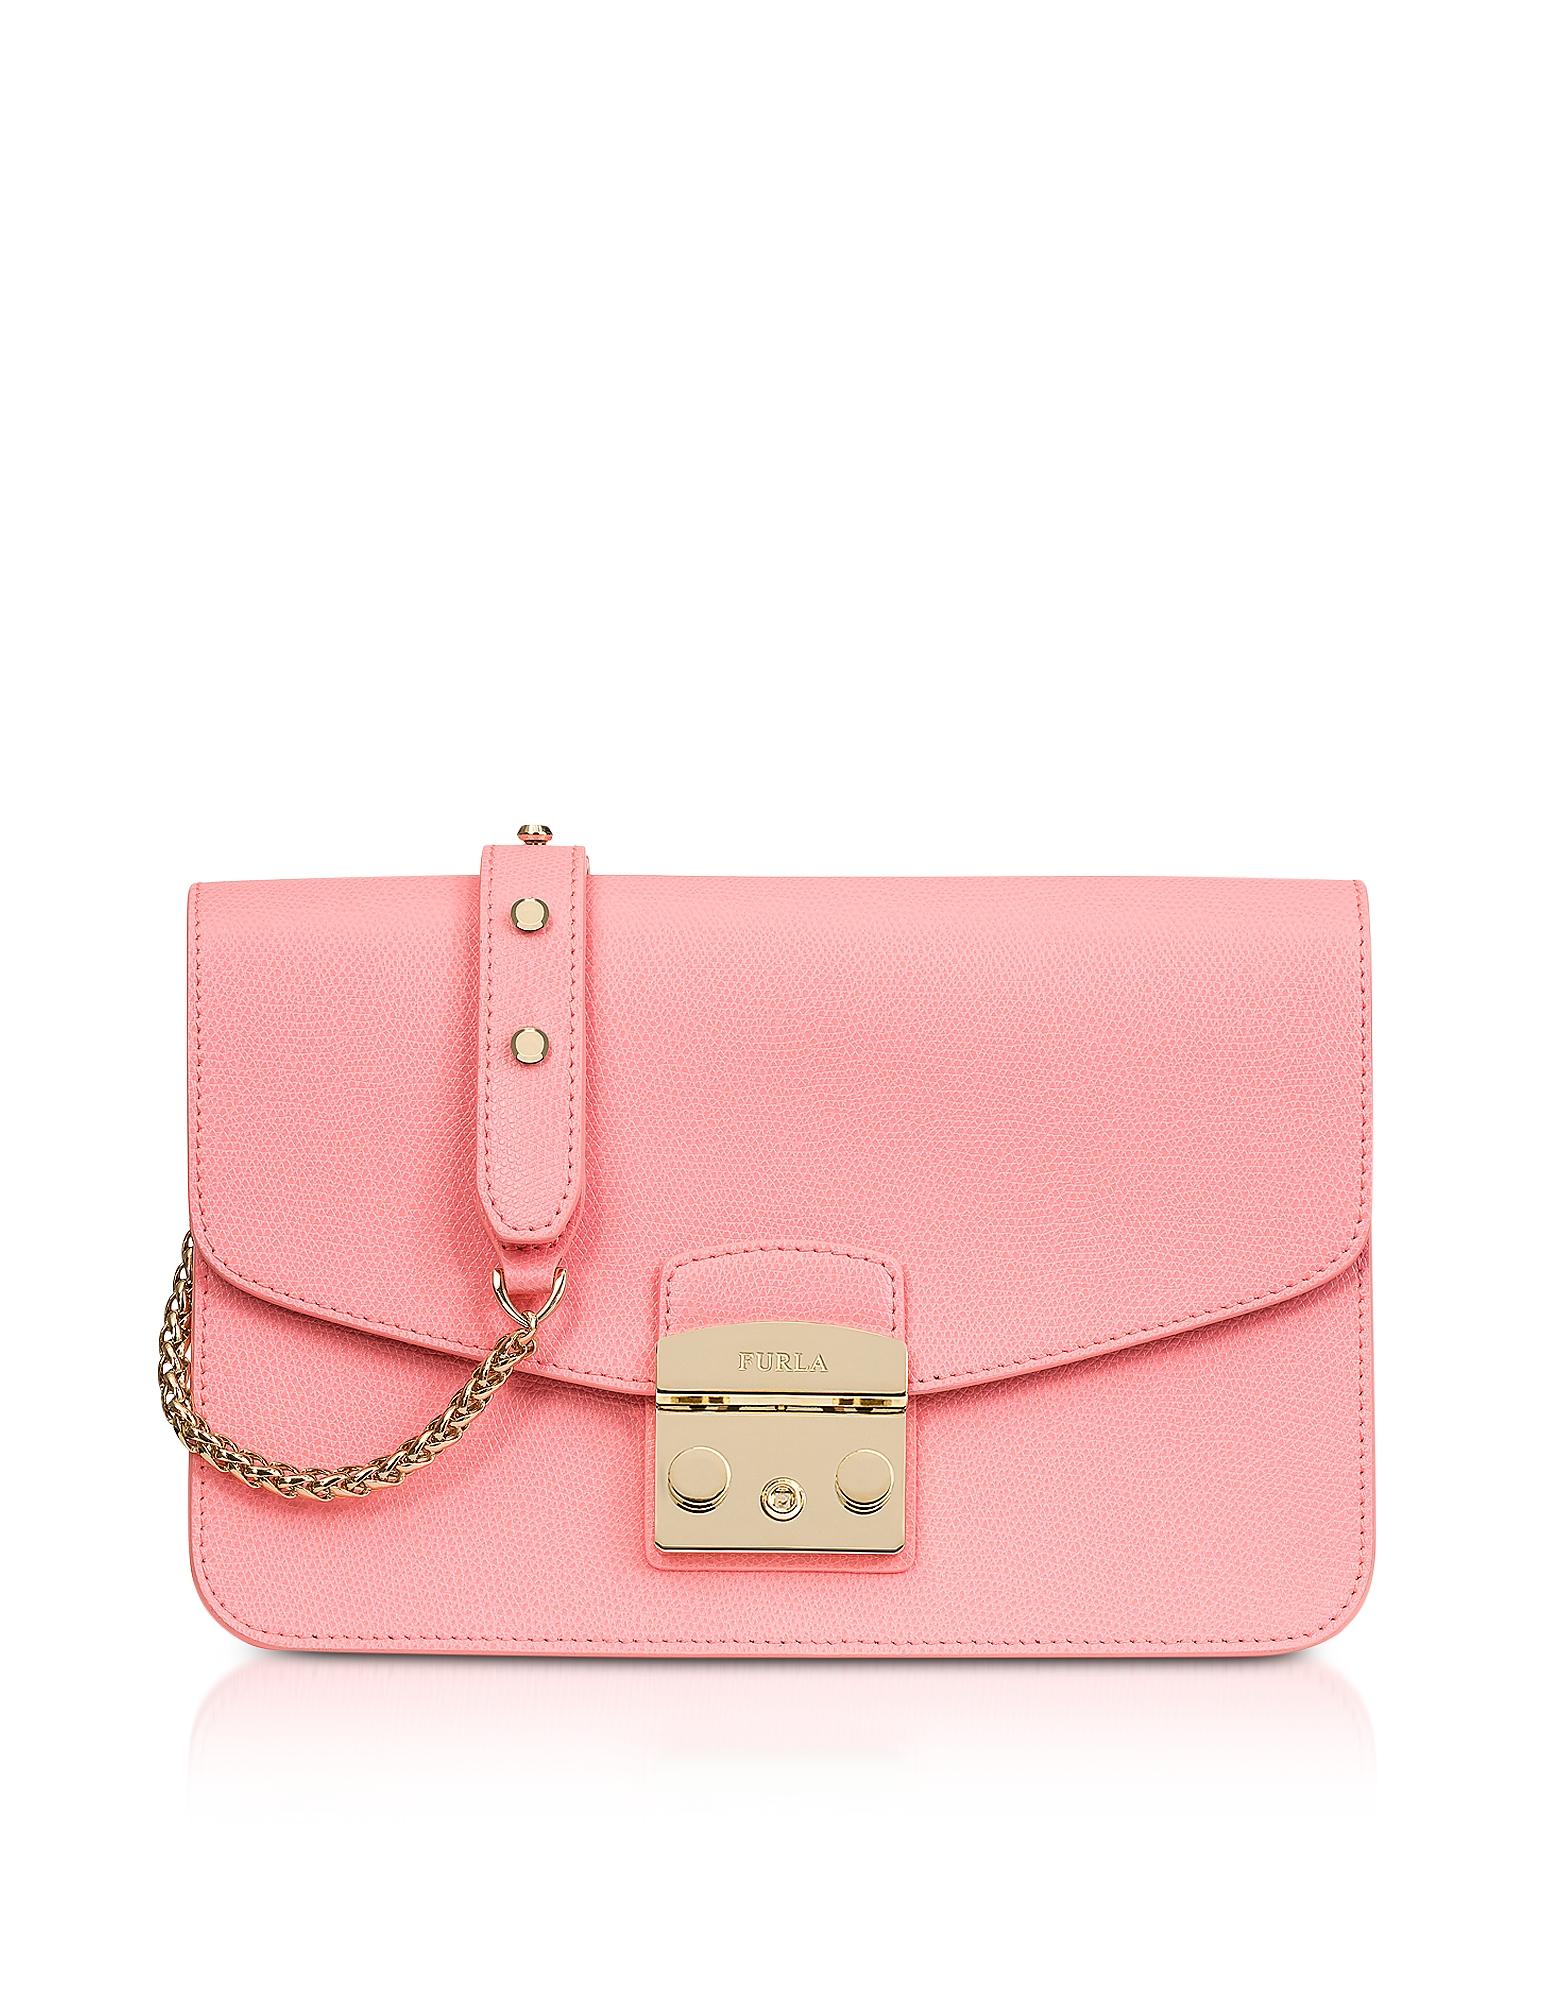 Furla Handbags, Rose Quartz Leather Metropolis Small Shoulder Bag